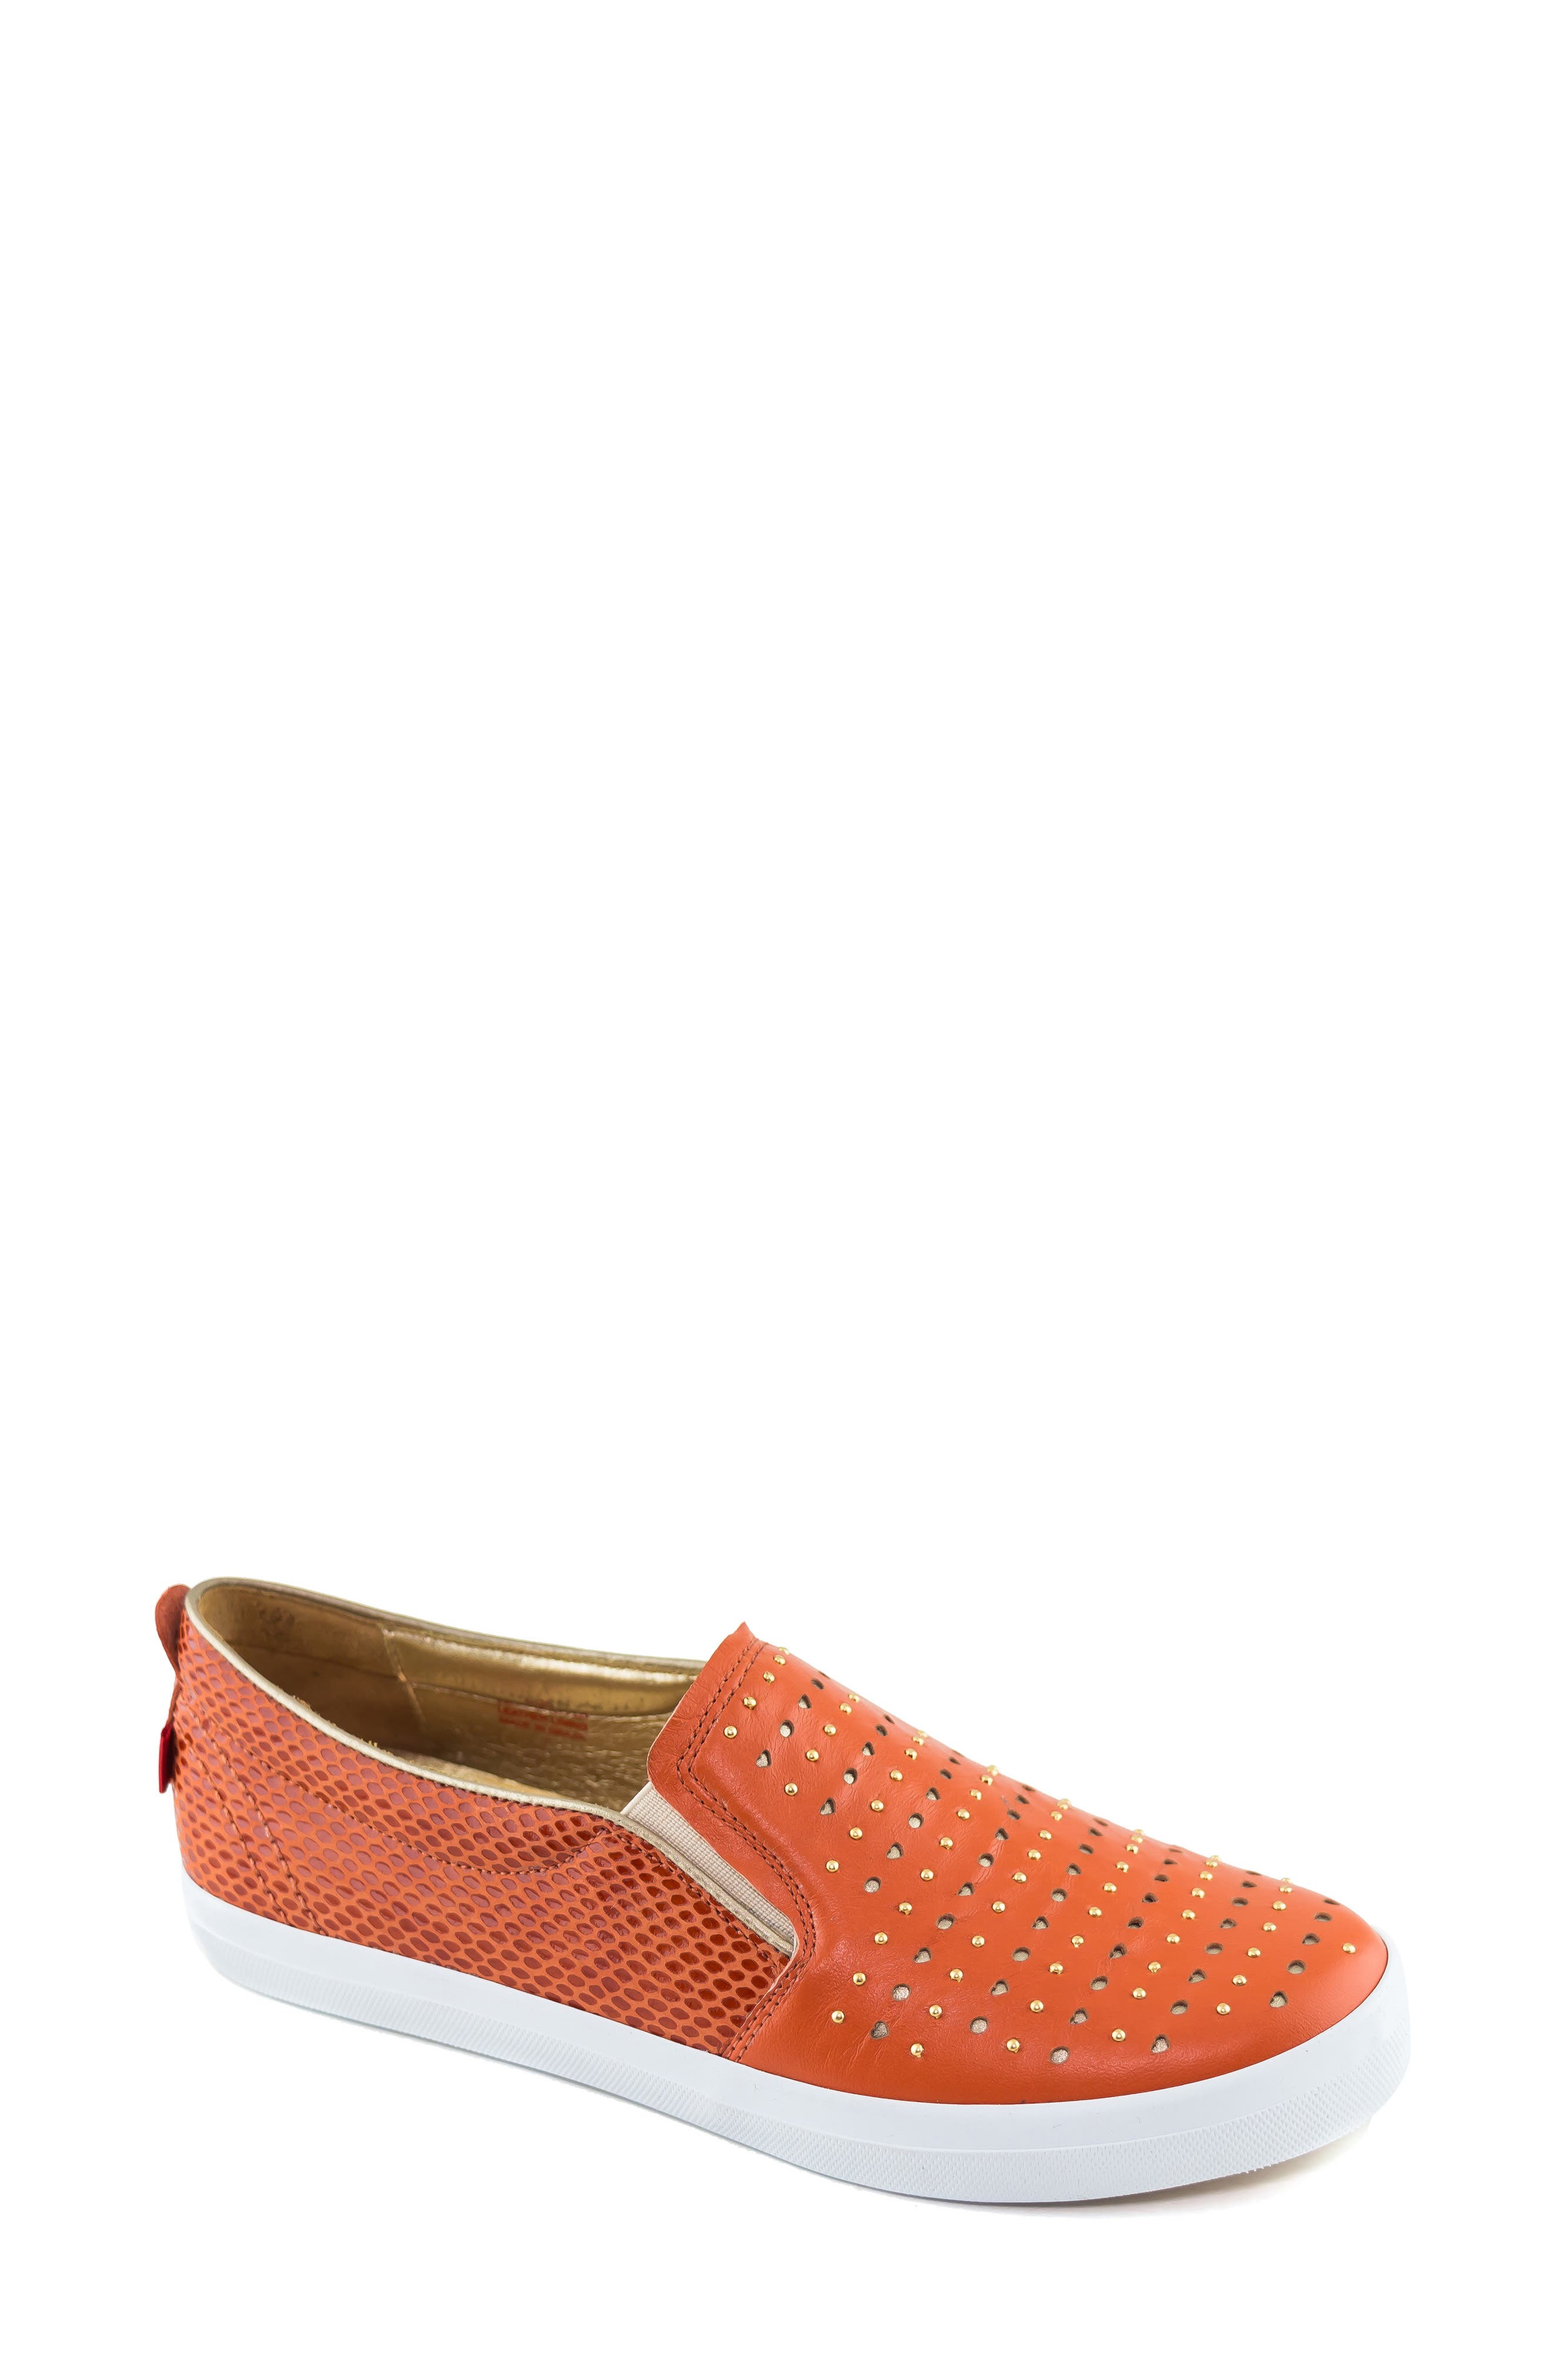 MARC JOSEPH NEW YORK Soho Sneaker, Main, color, CORAL LEATHER